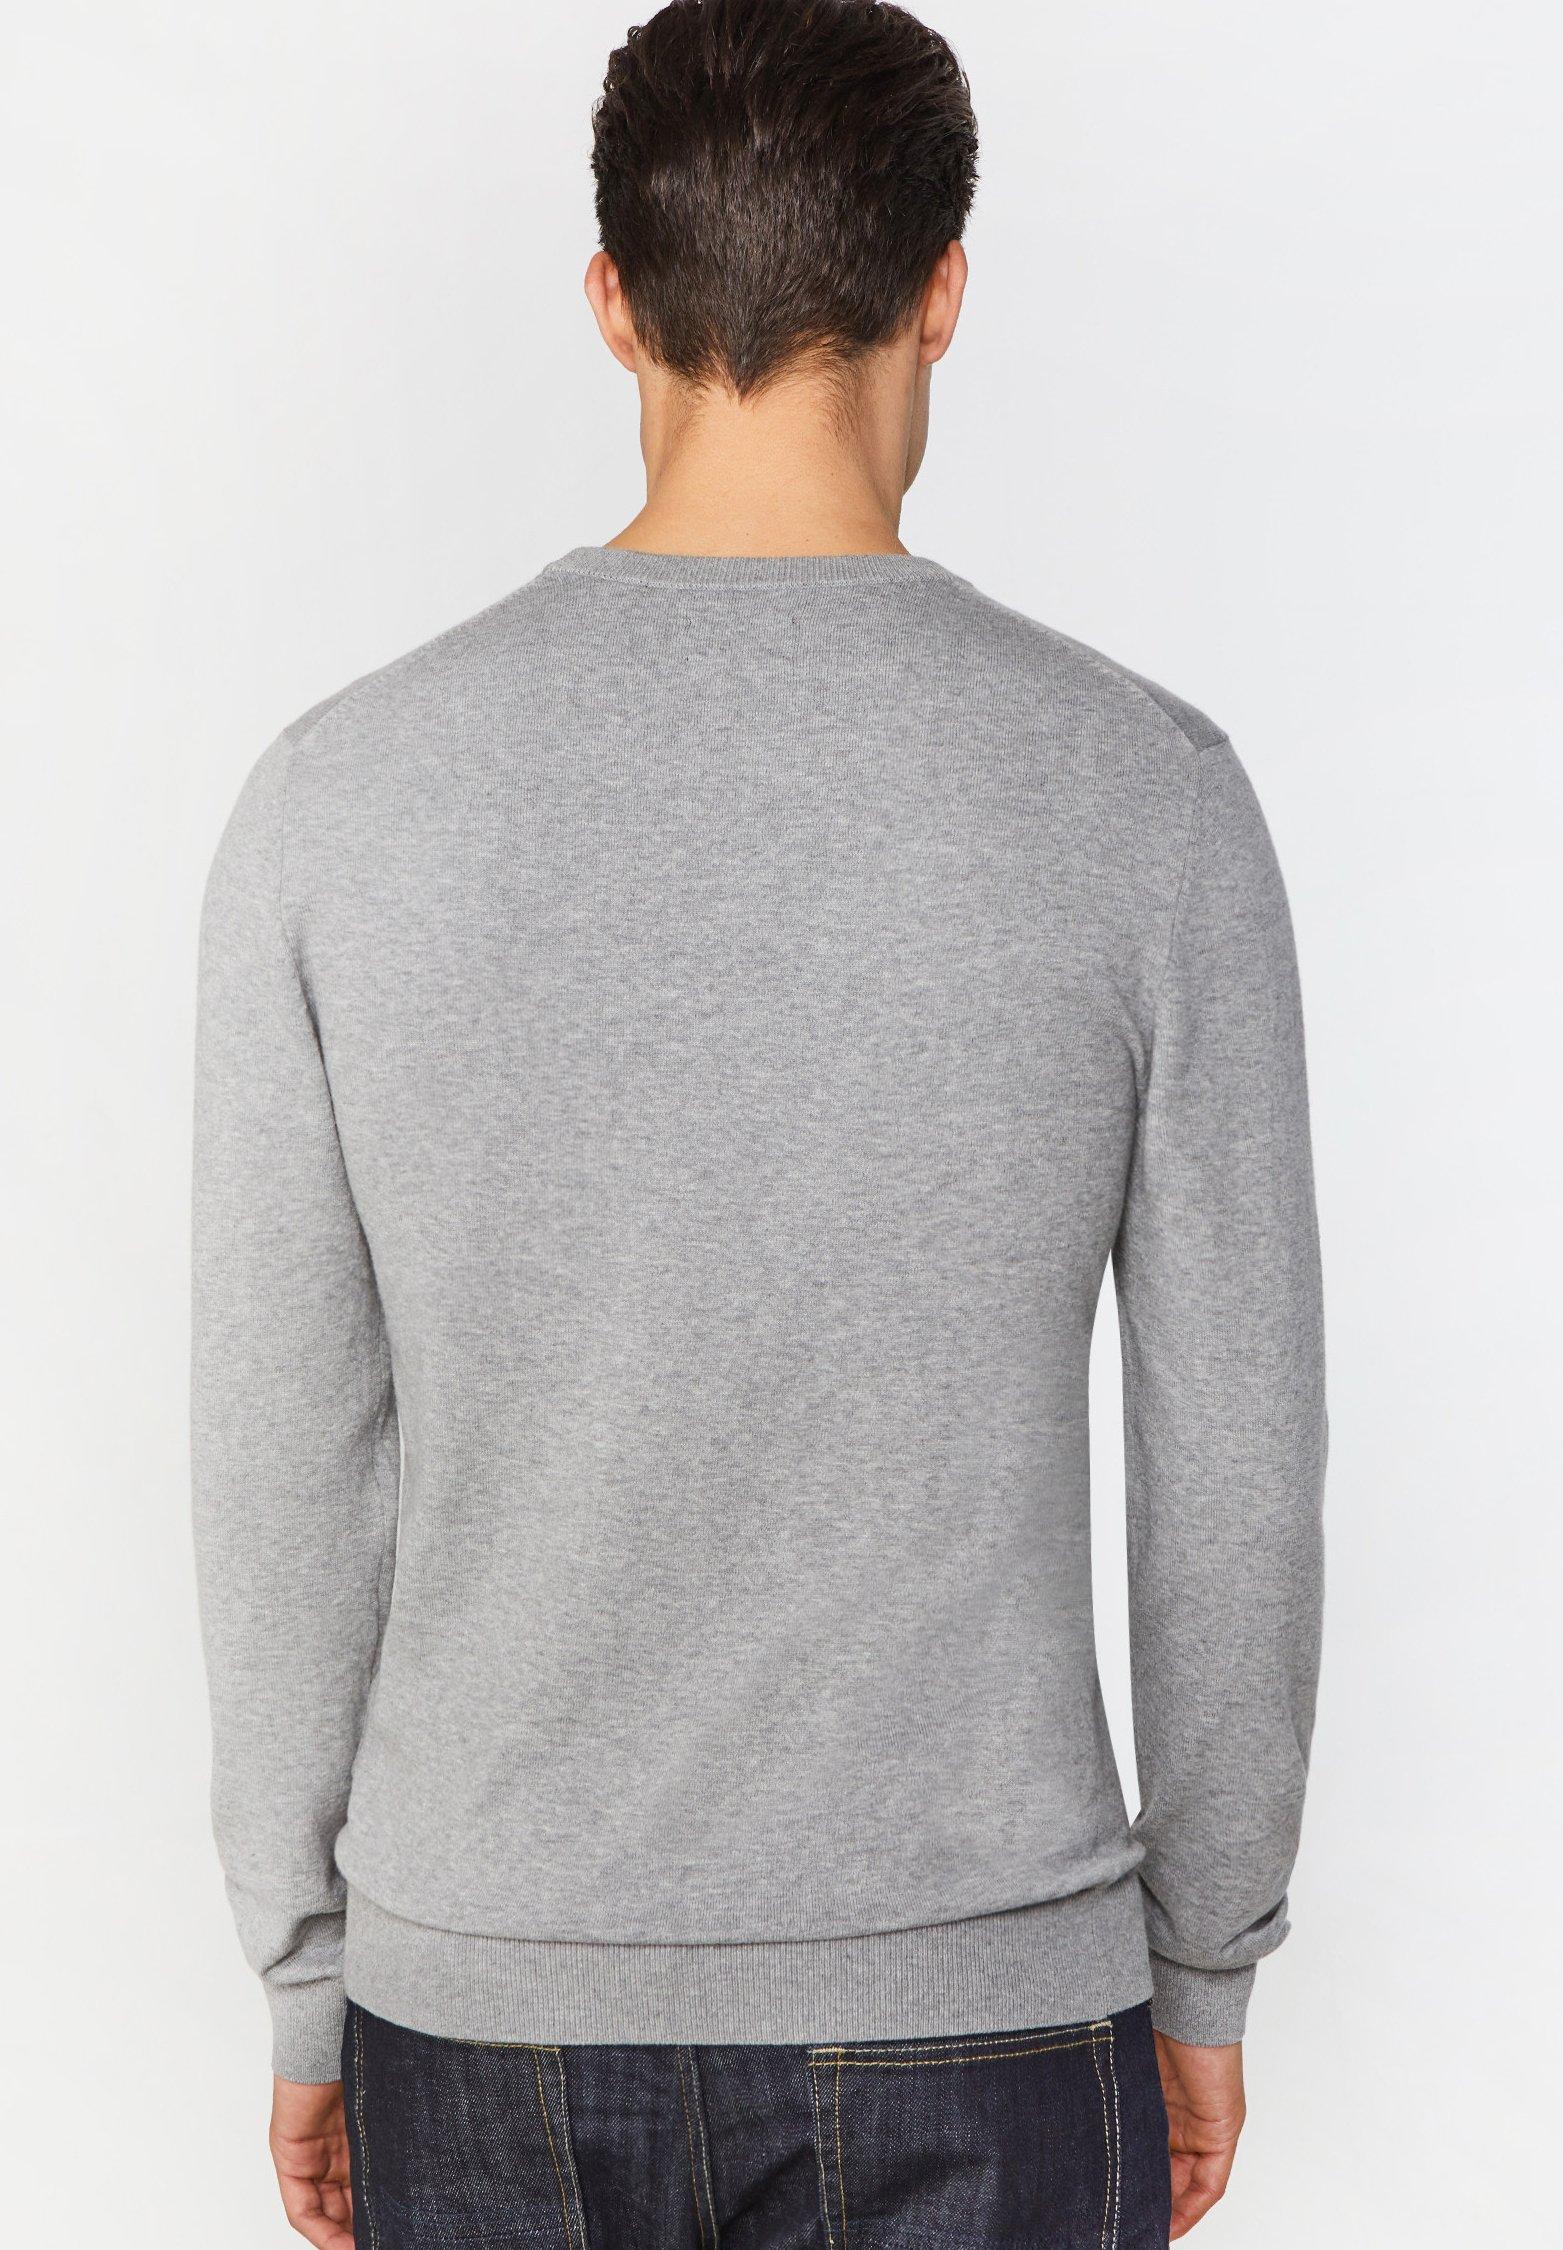 HEREN CREW NECK TRUI | 78776111 WE Fashion